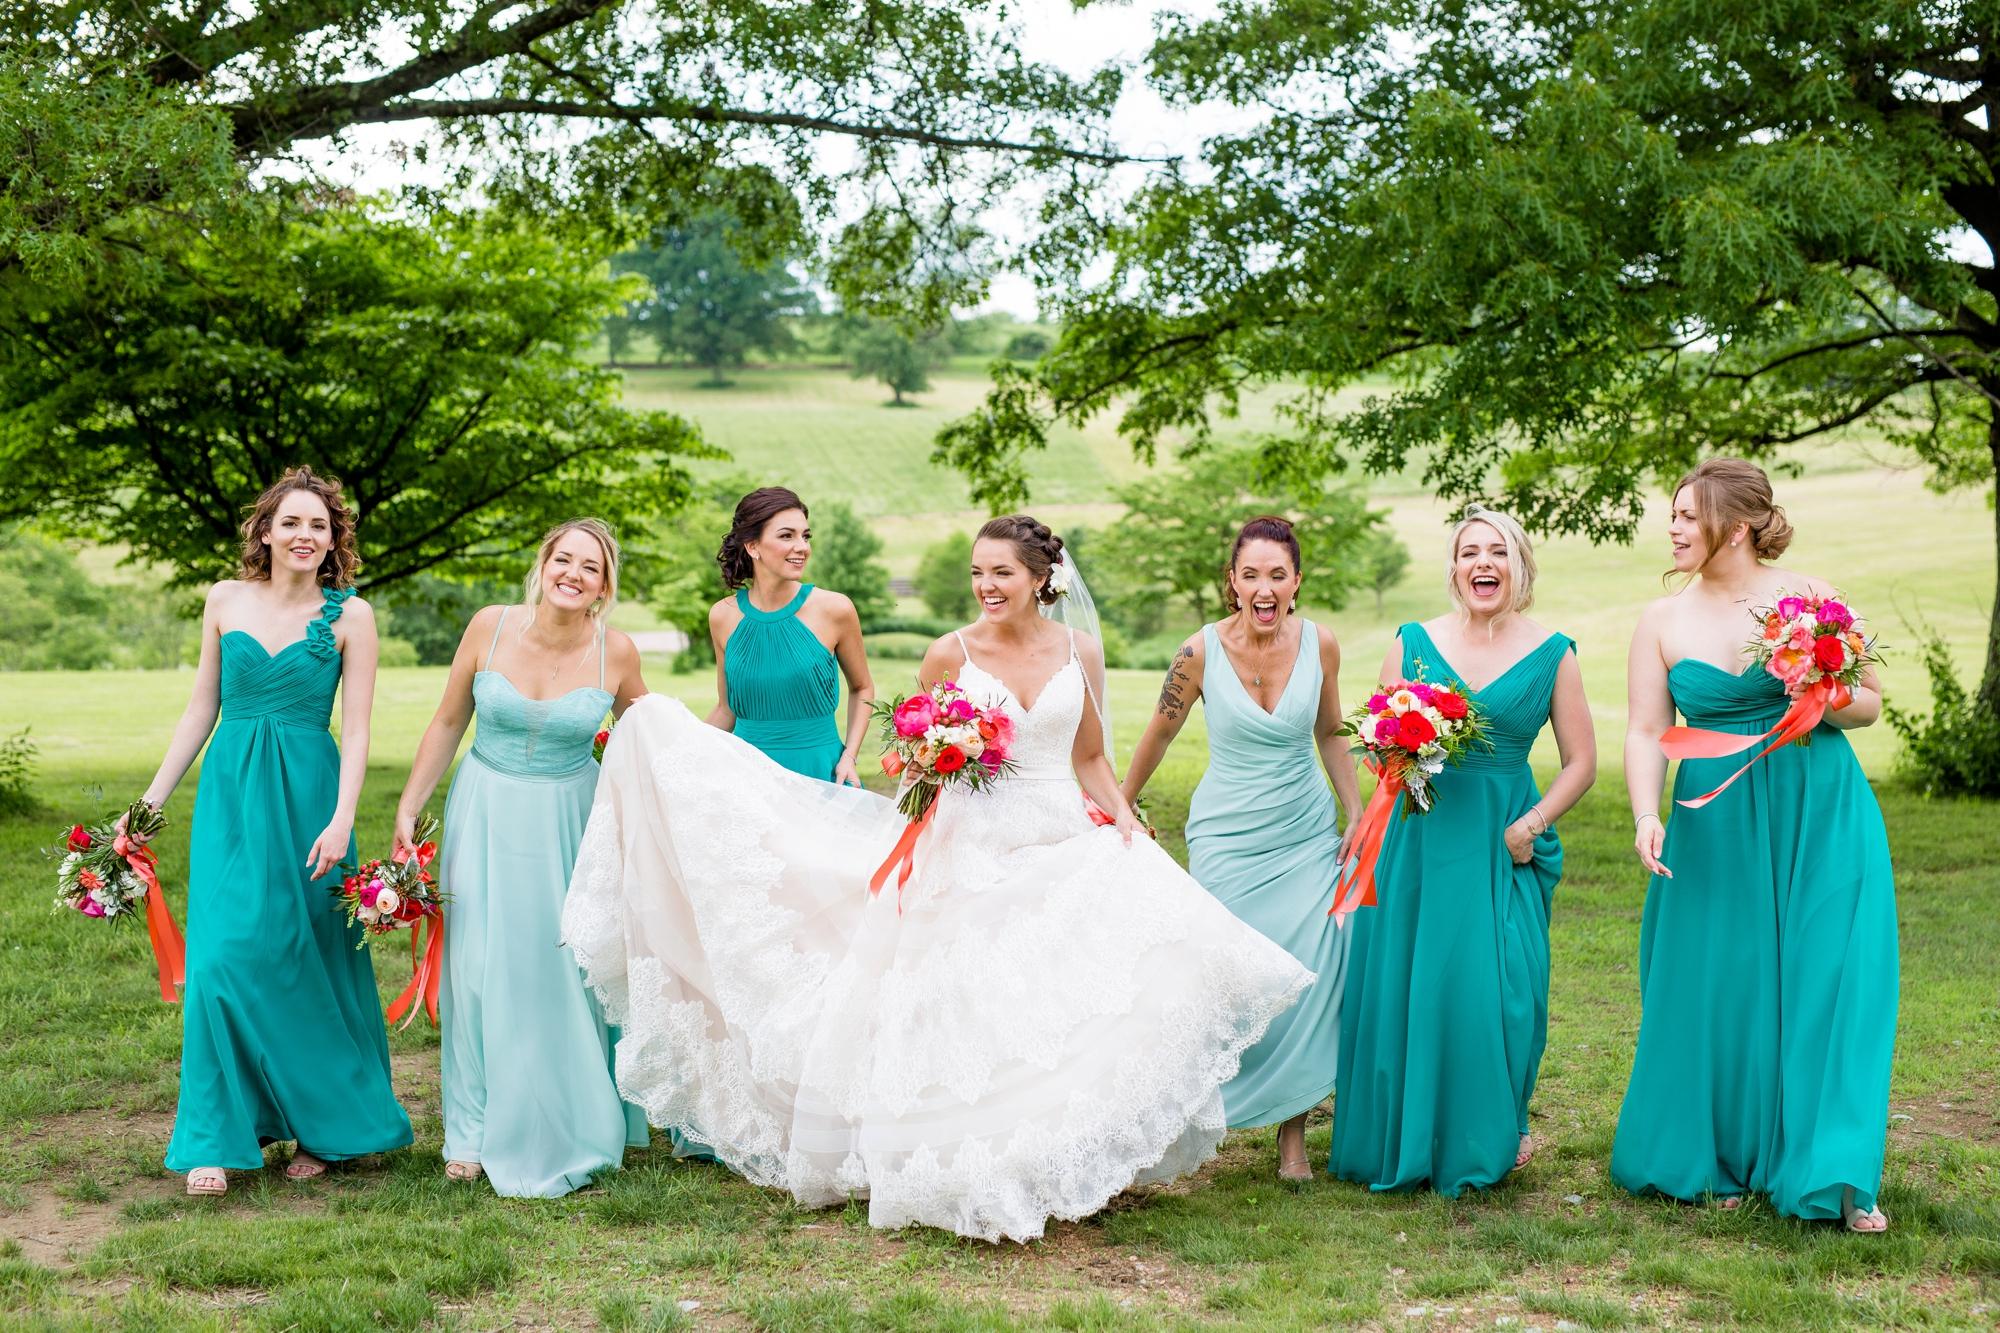 antonelli's event center wedding photos, pittsburgh wedding photographer, antonelli's event center wedding pictures, good shepherd church braddock